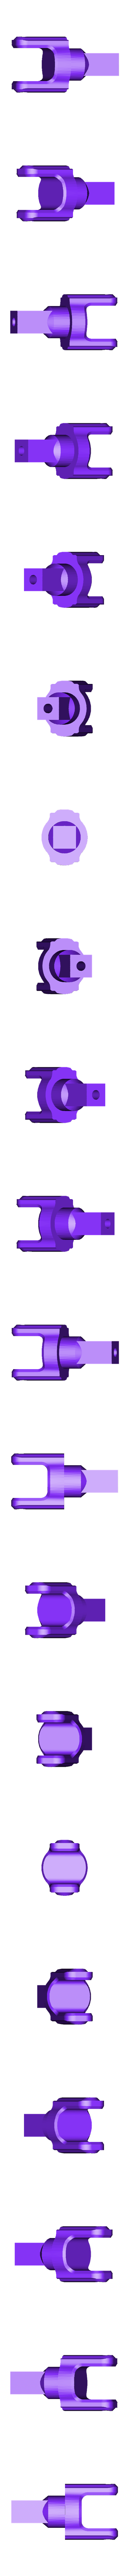 TruckV3_Axle_front_U-joint2x2.STL Download STL file 3D Printed RC Truck V3 • 3D print model, MrCrankyface